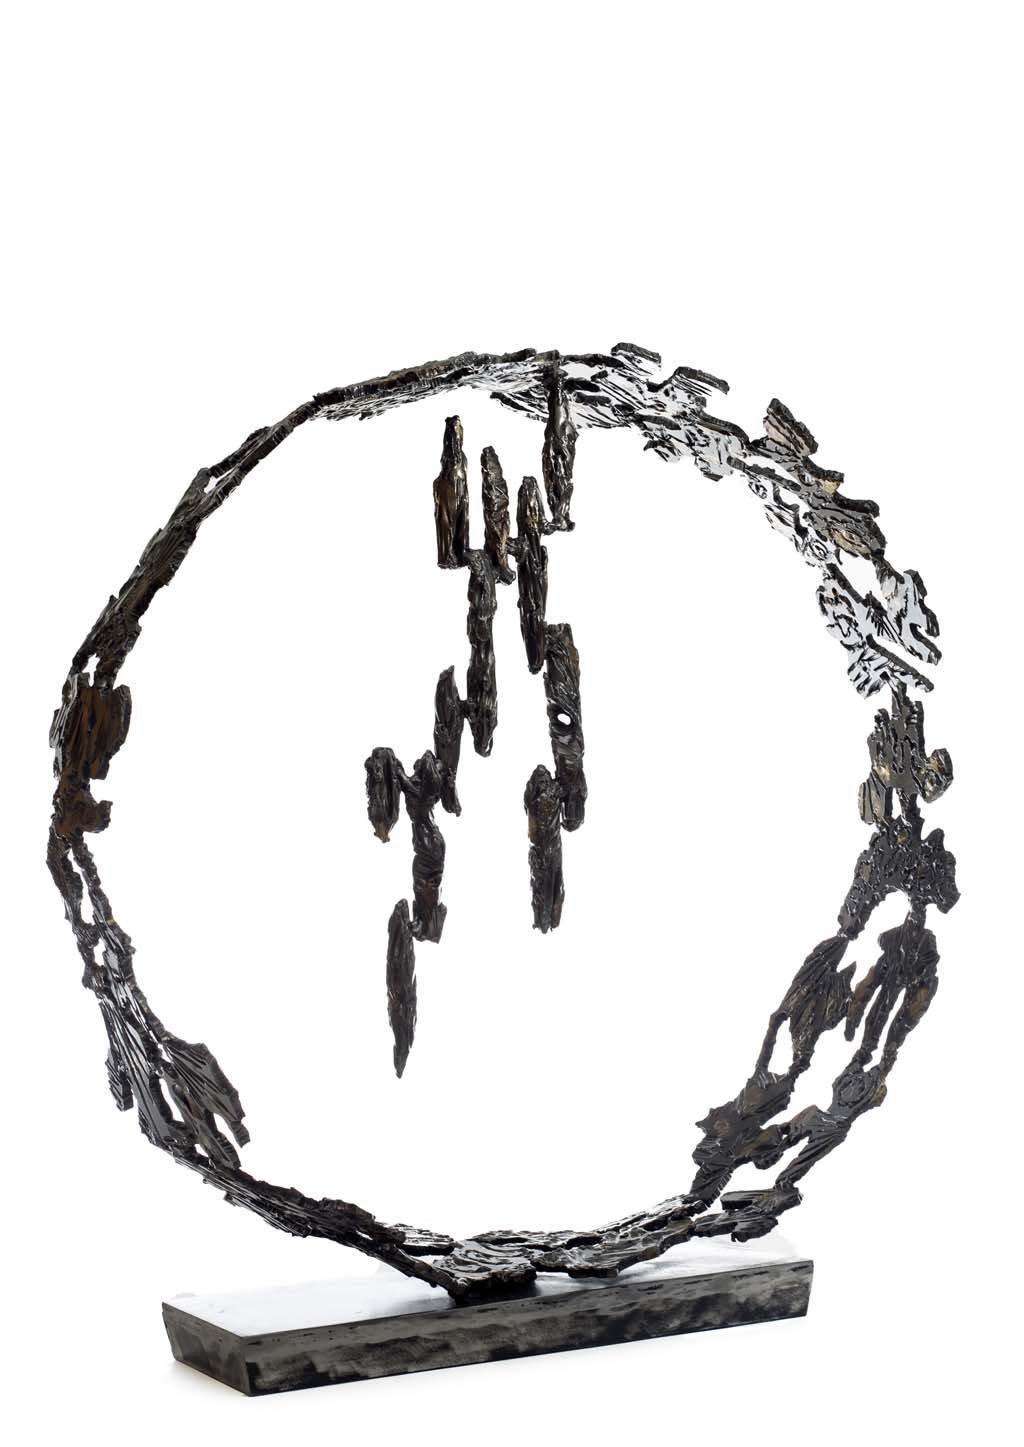 Insights VI | 2014 | Iron & brass sculpture of the Israeli artist, sculptor Rami Ater